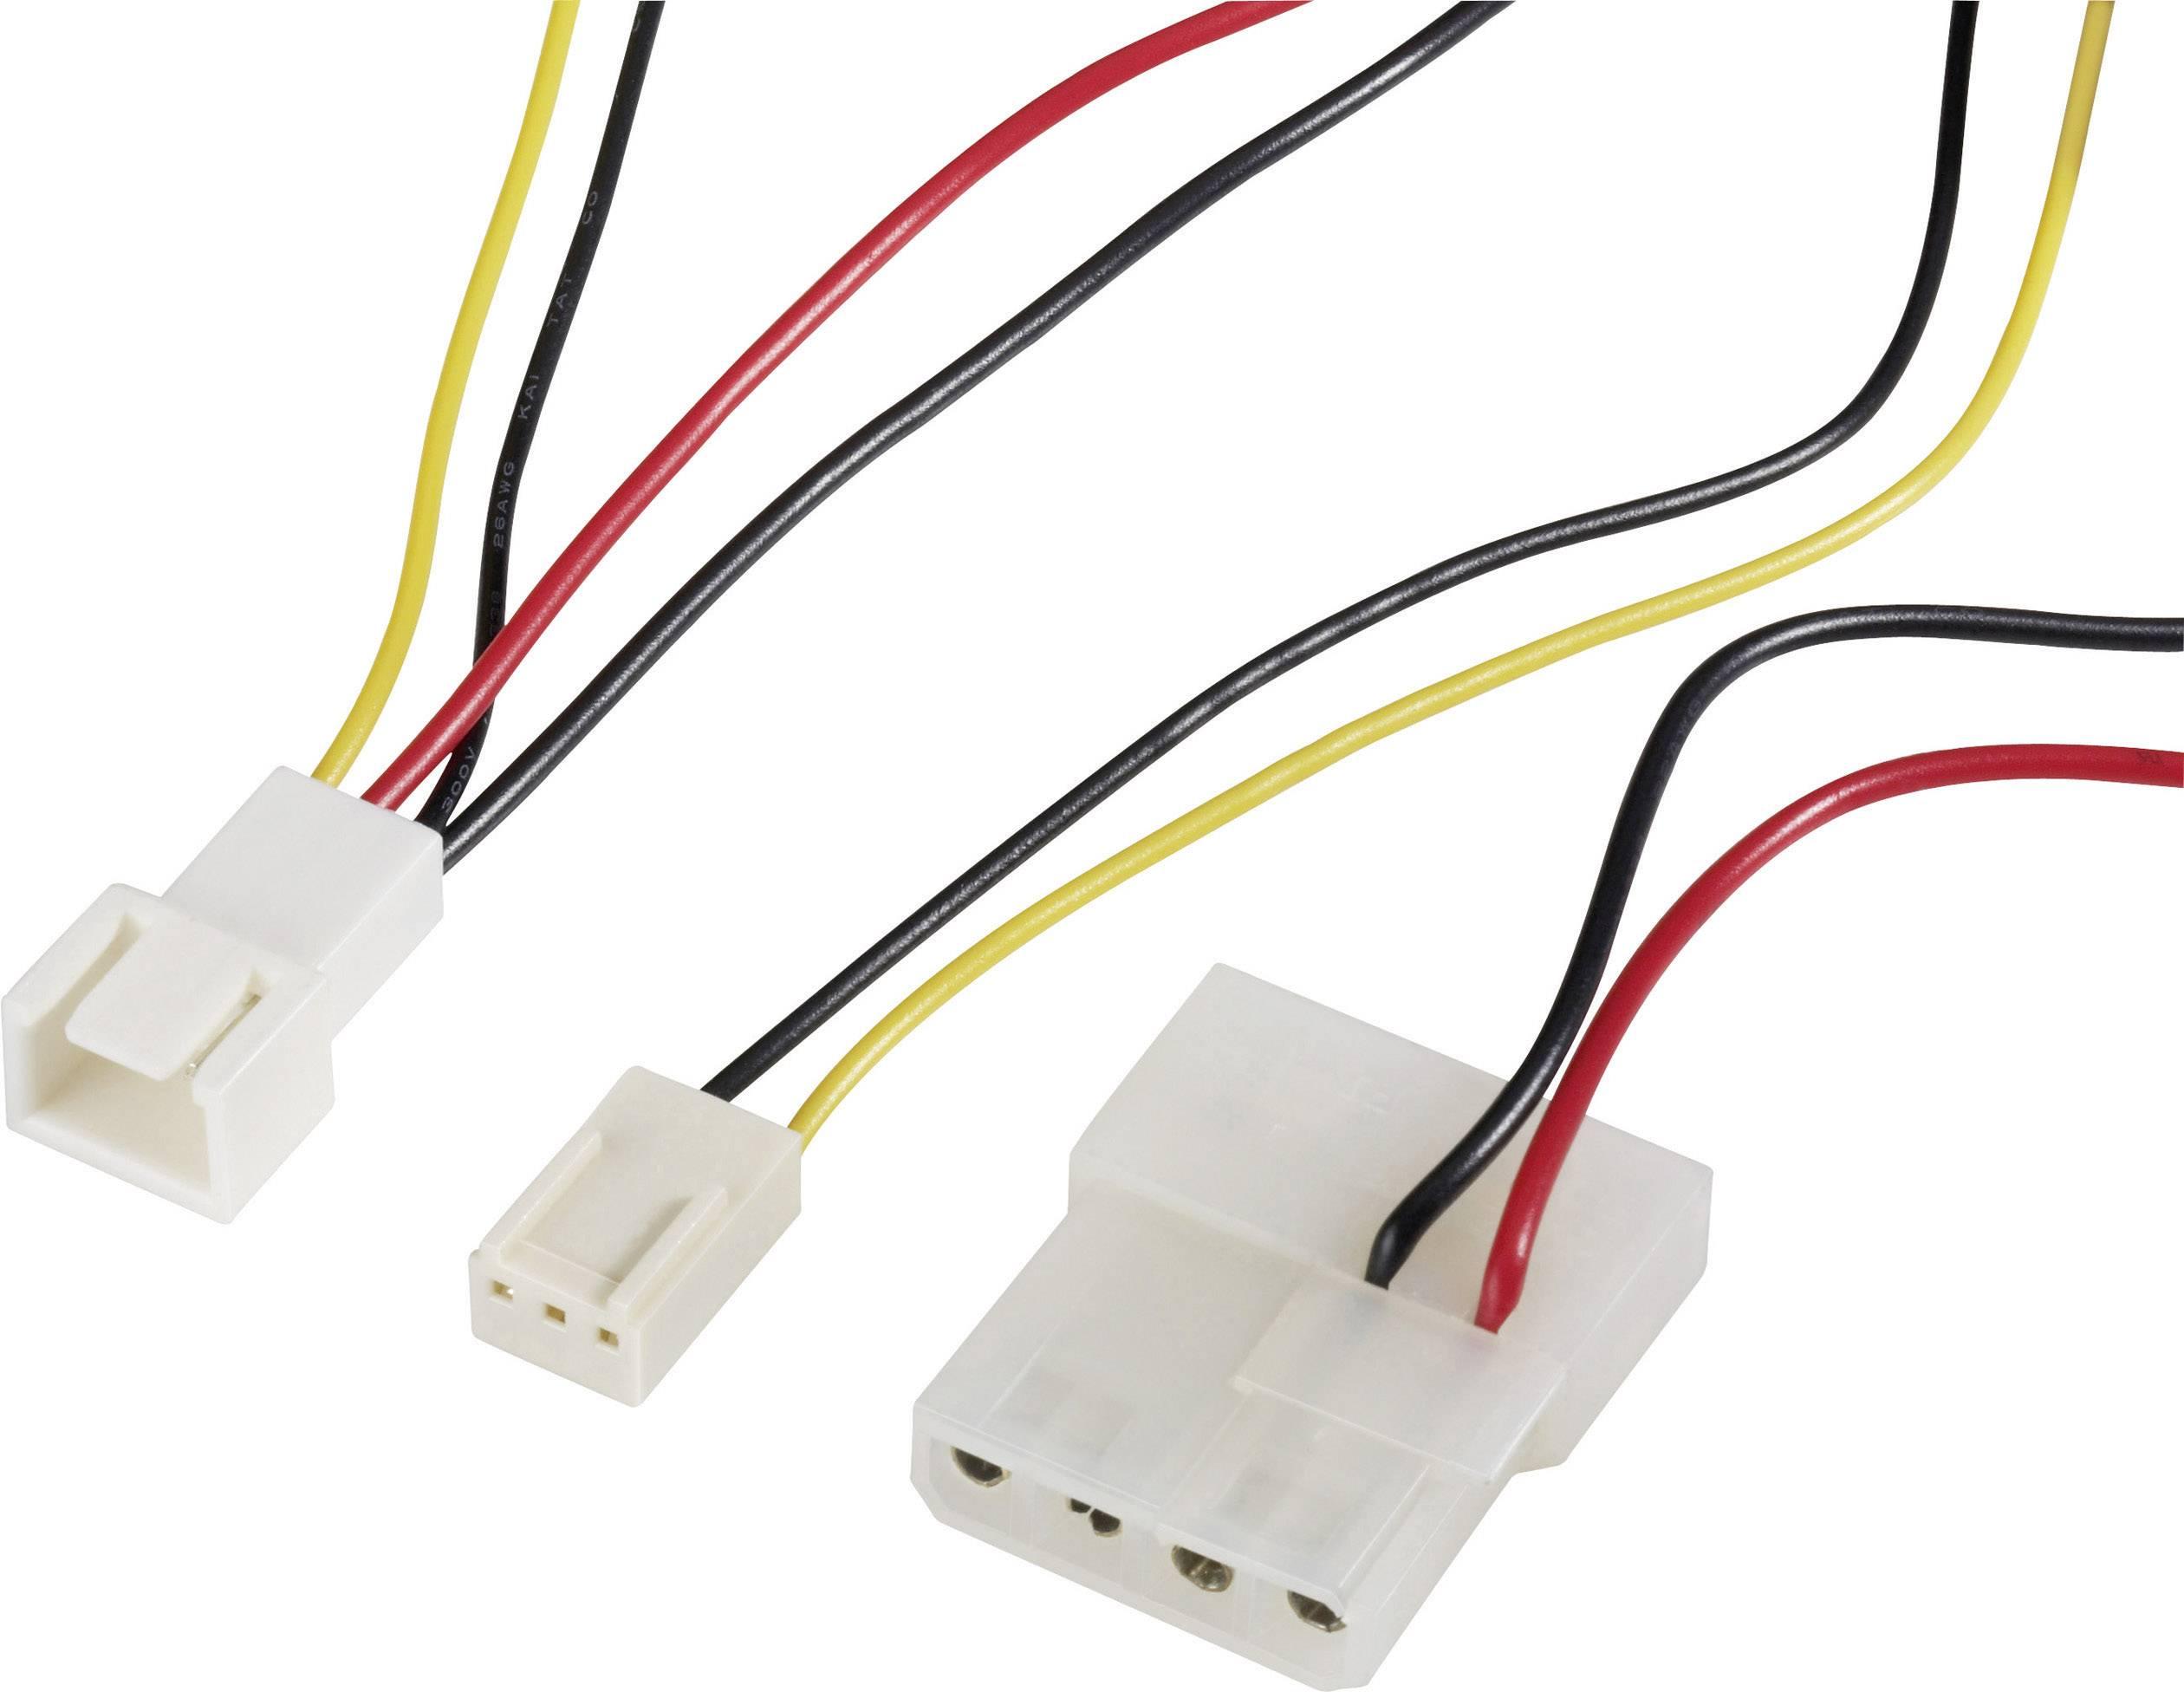 Aansluitkabel PC-ventilator [1x PC-ventilator stekker 3-polig - 1x ...